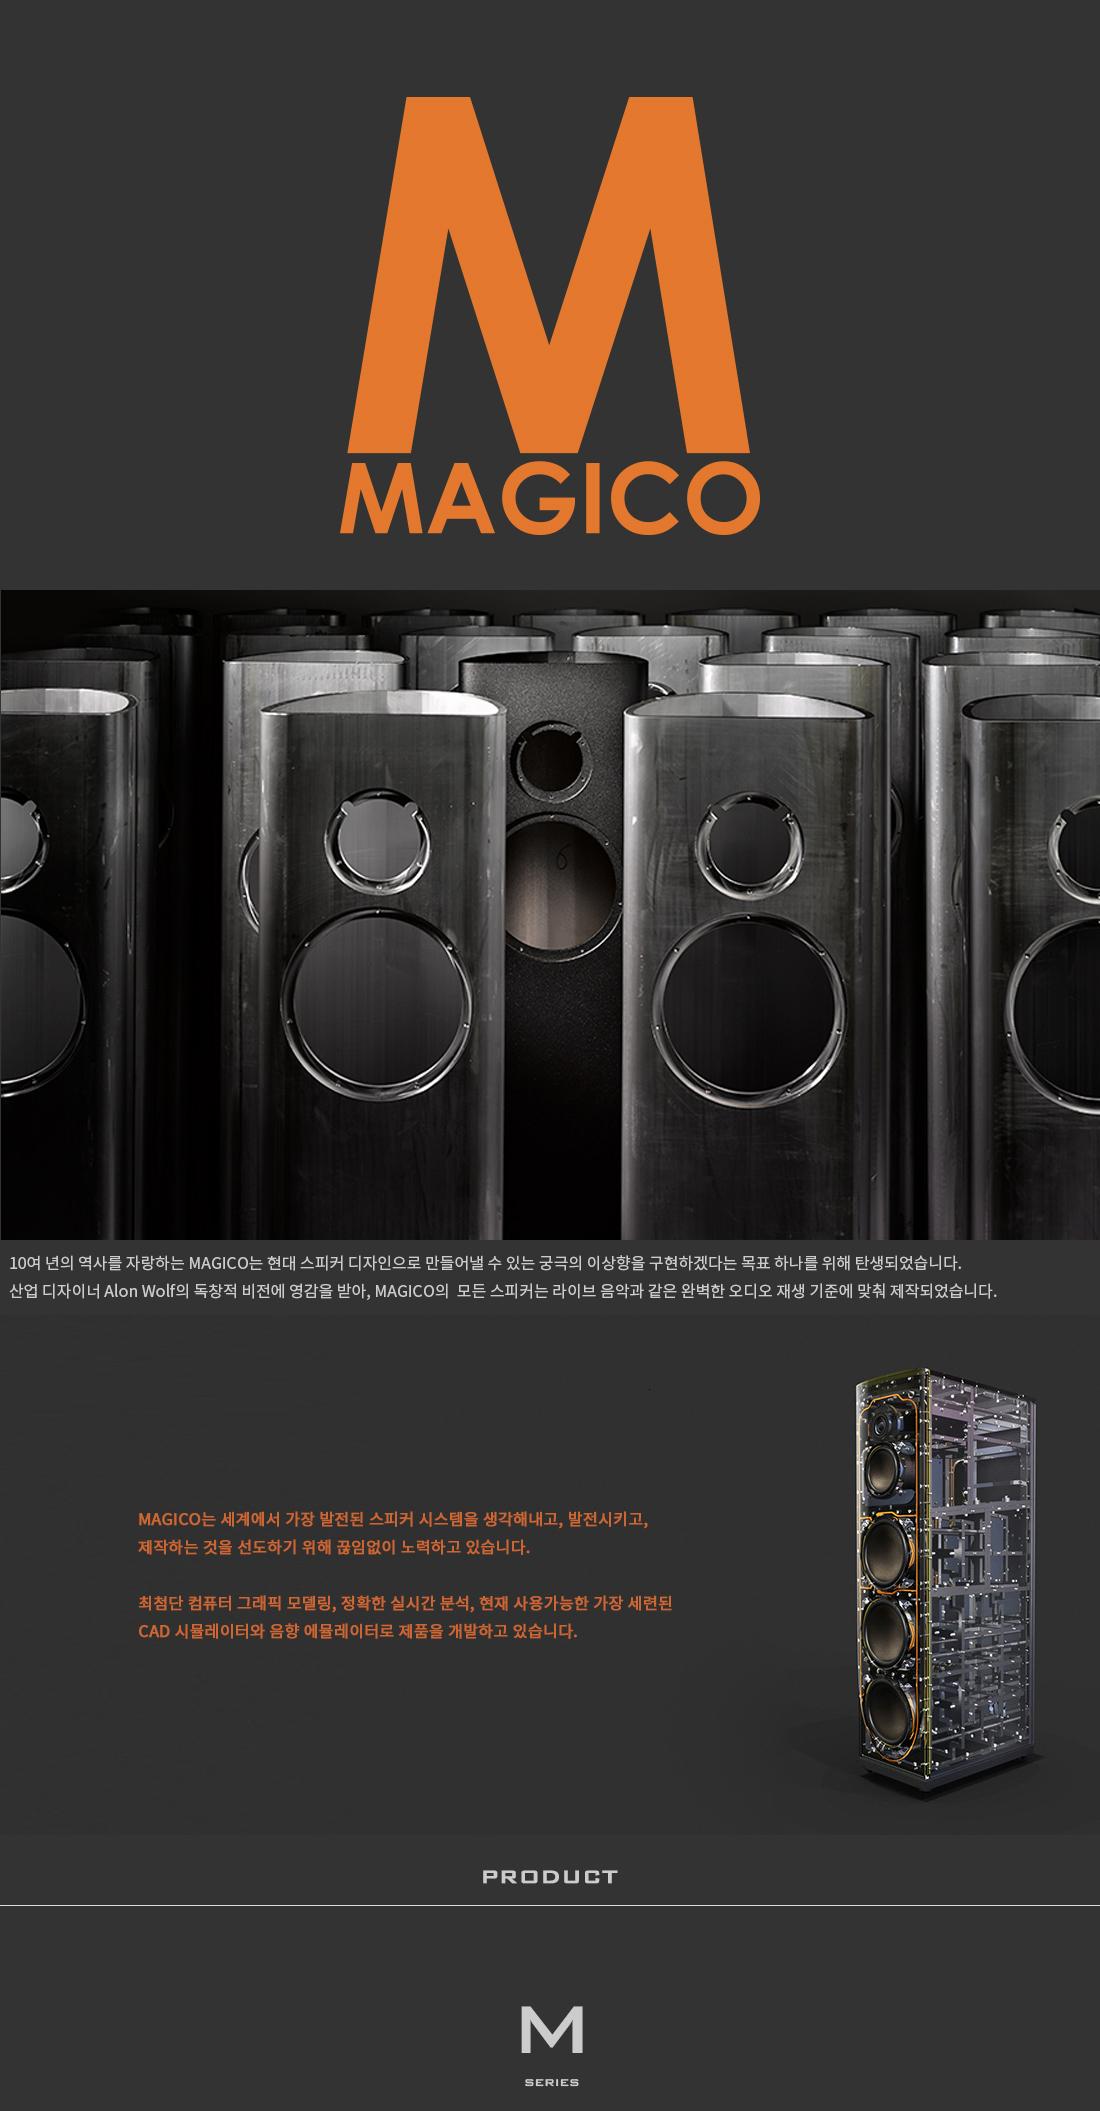 MAGICO_01.jpg